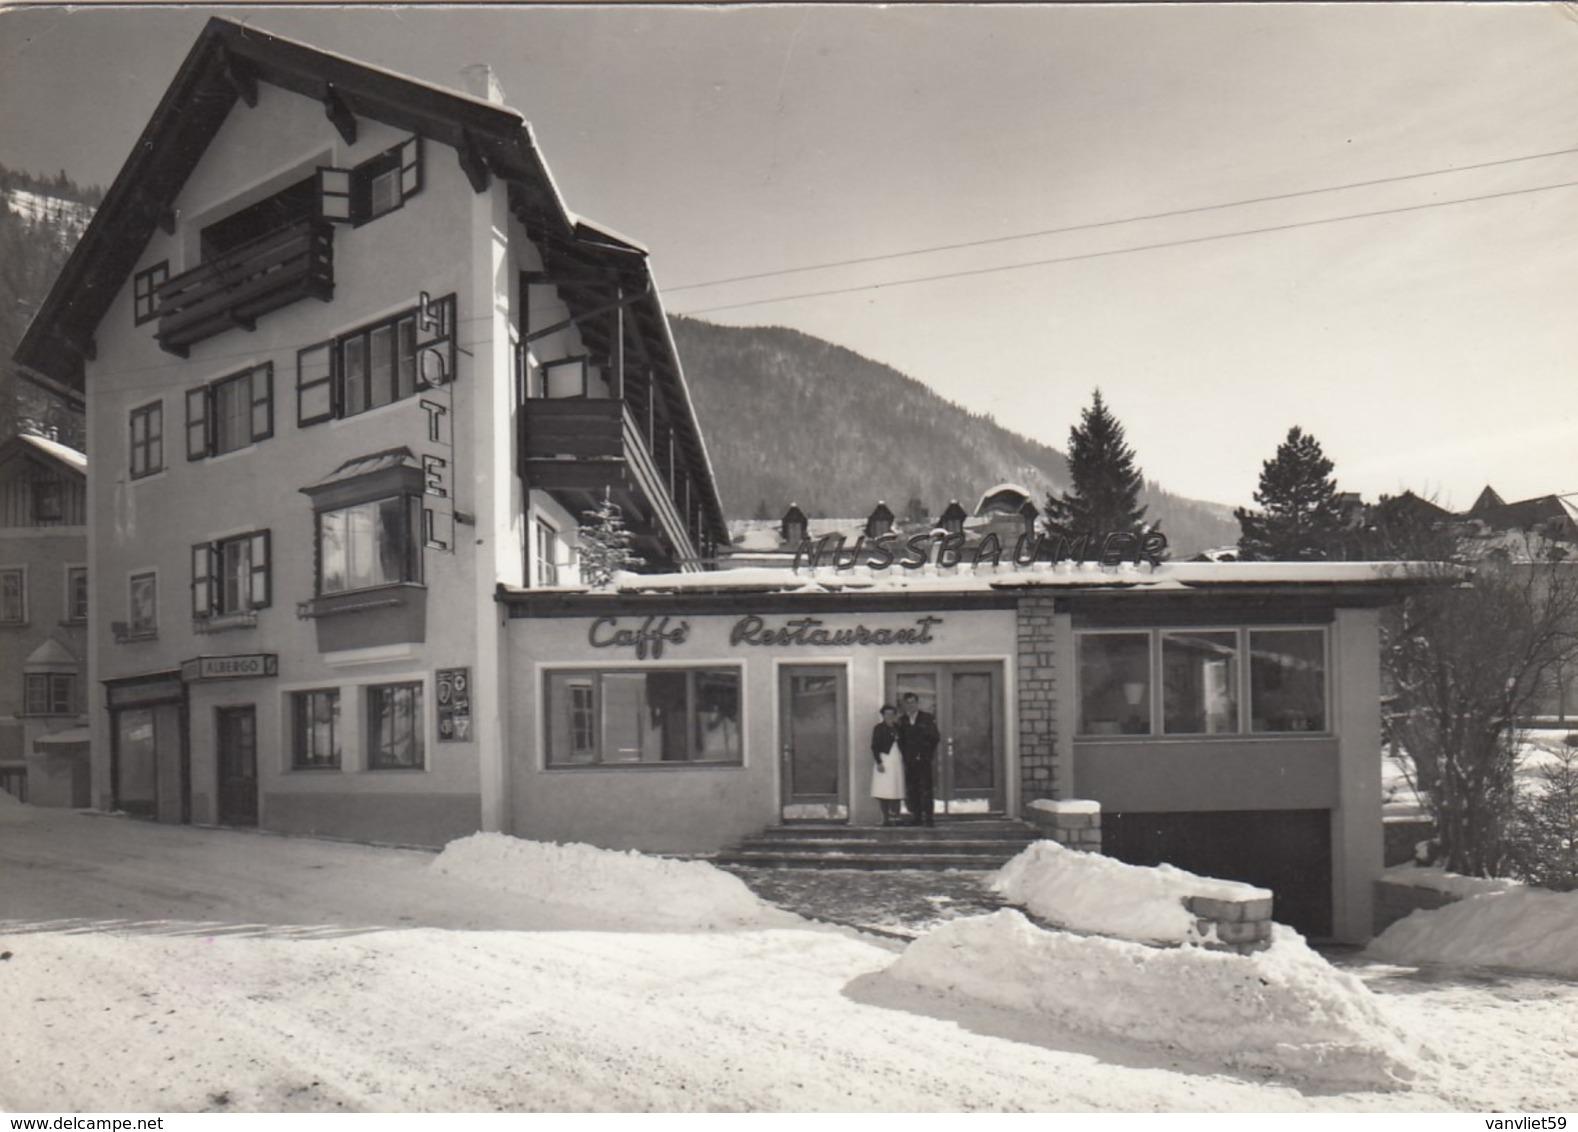 GOSSENSASS-COLLE ISARCO-BOZEN-BOLZANO-HOTEL=HUSSBAUMER=-CARTOLINA VERA FOTOGRAFIA VIAGGIATA NEL 1965 - Bolzano (Bozen)